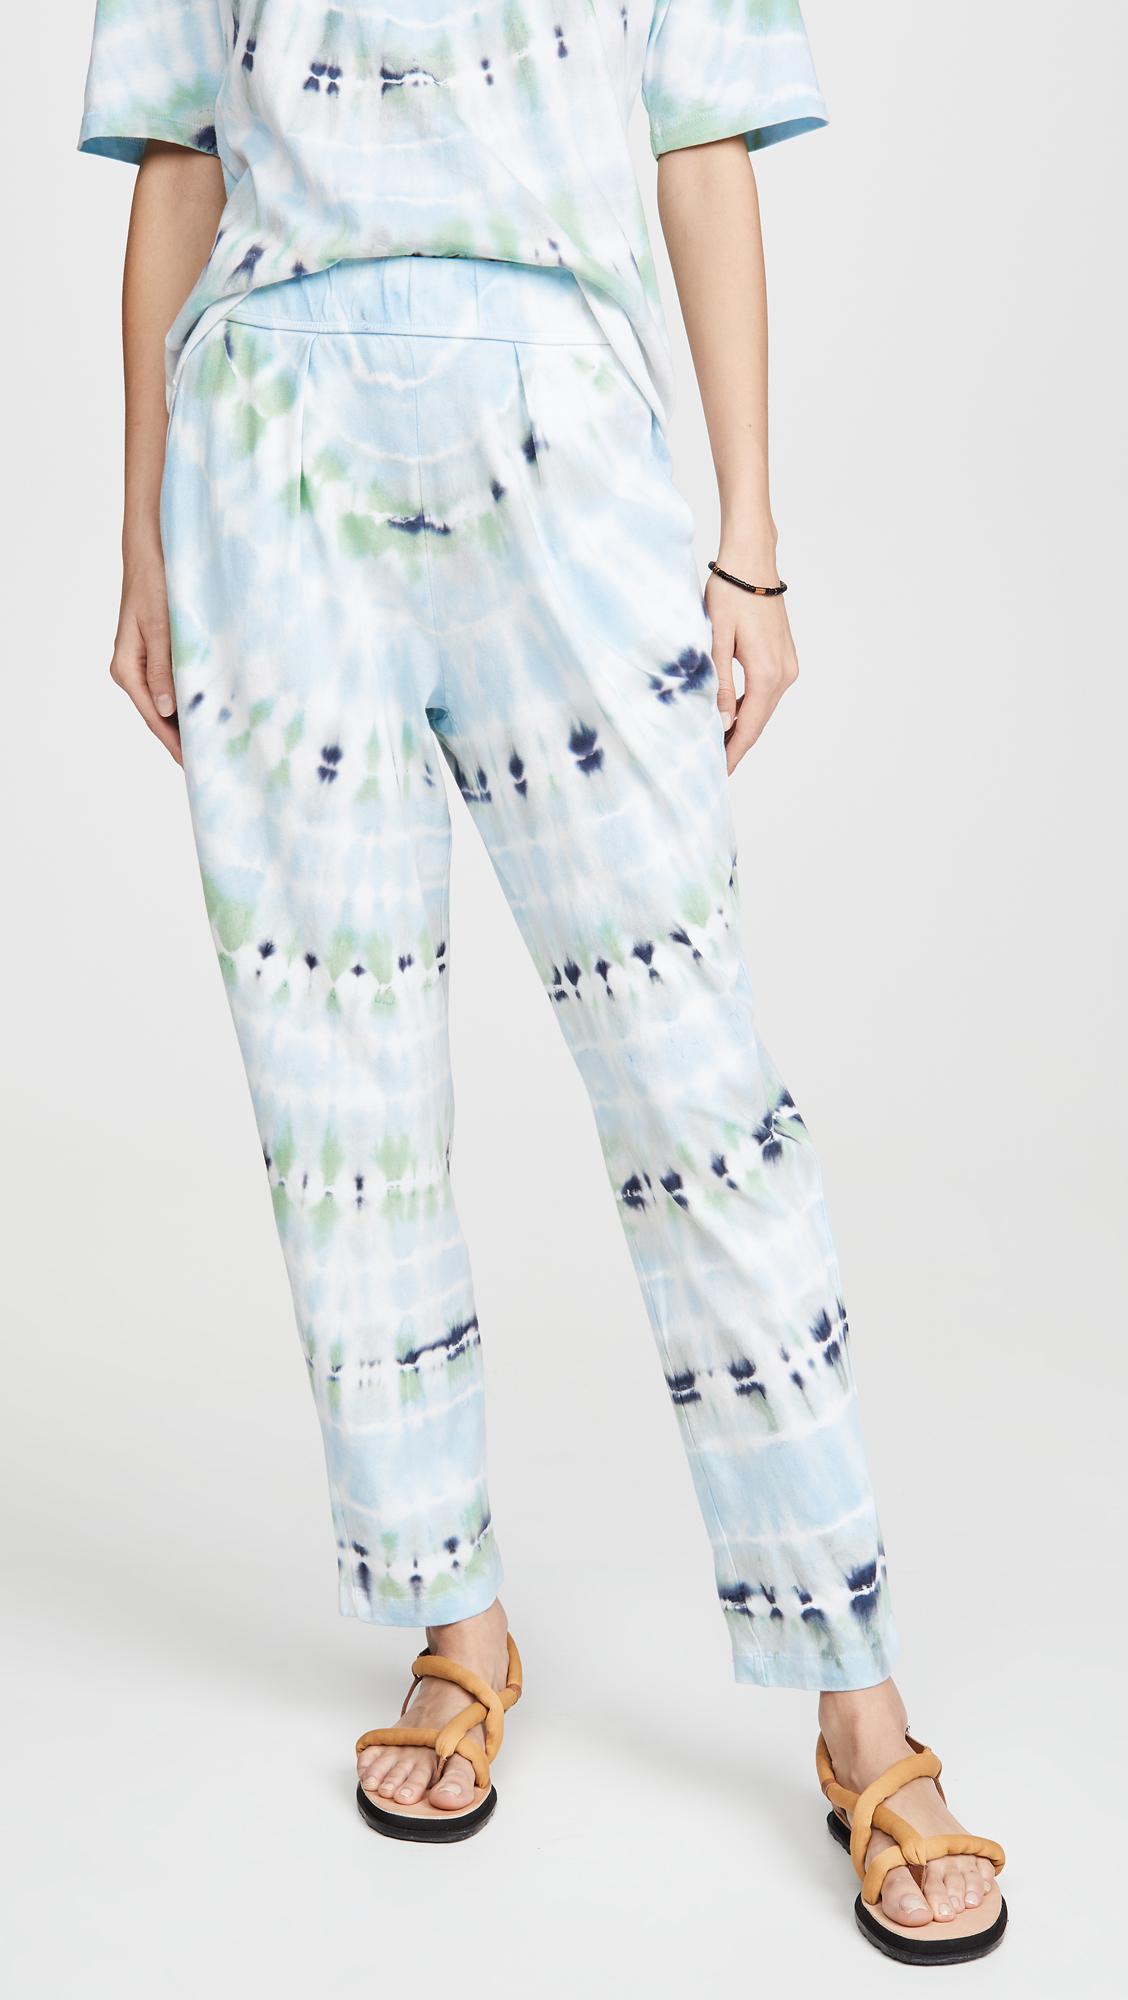 Nina Dobrev's Tie-Dye Matching Set Is Absolutely My Next Purchase 29